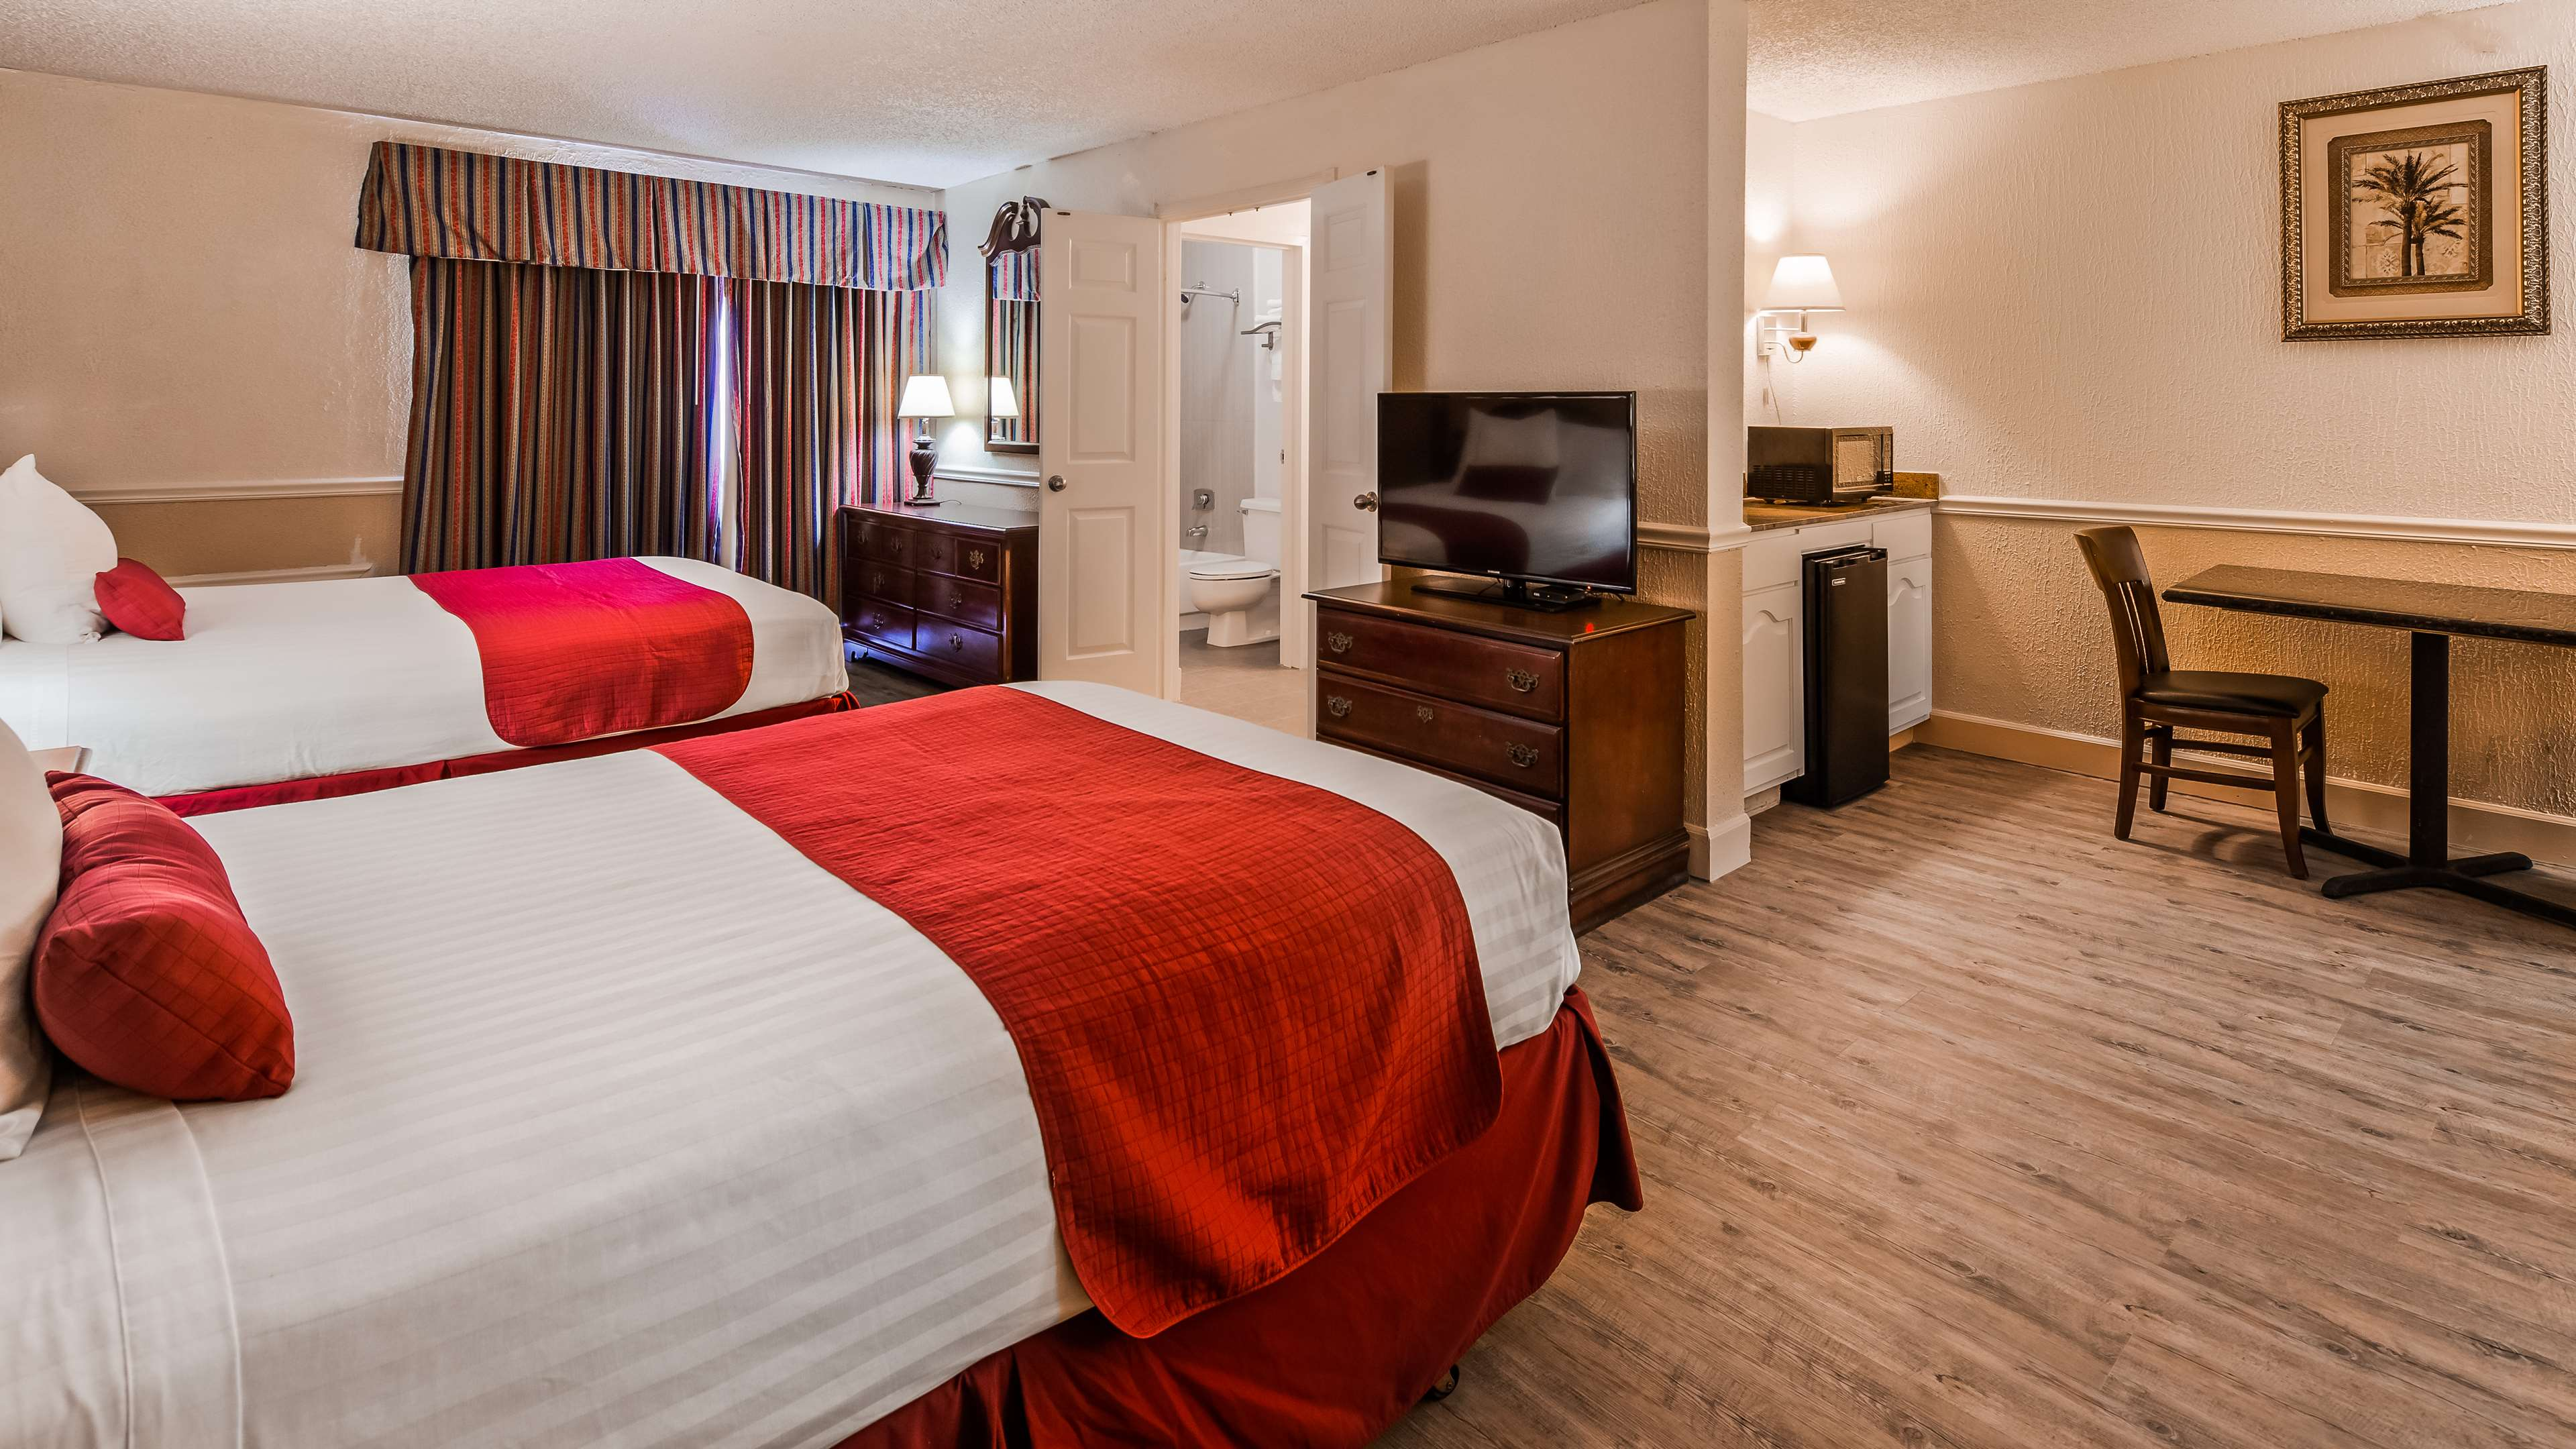 SureStay Plus Hotel by Best Western Baton Rouge image 15